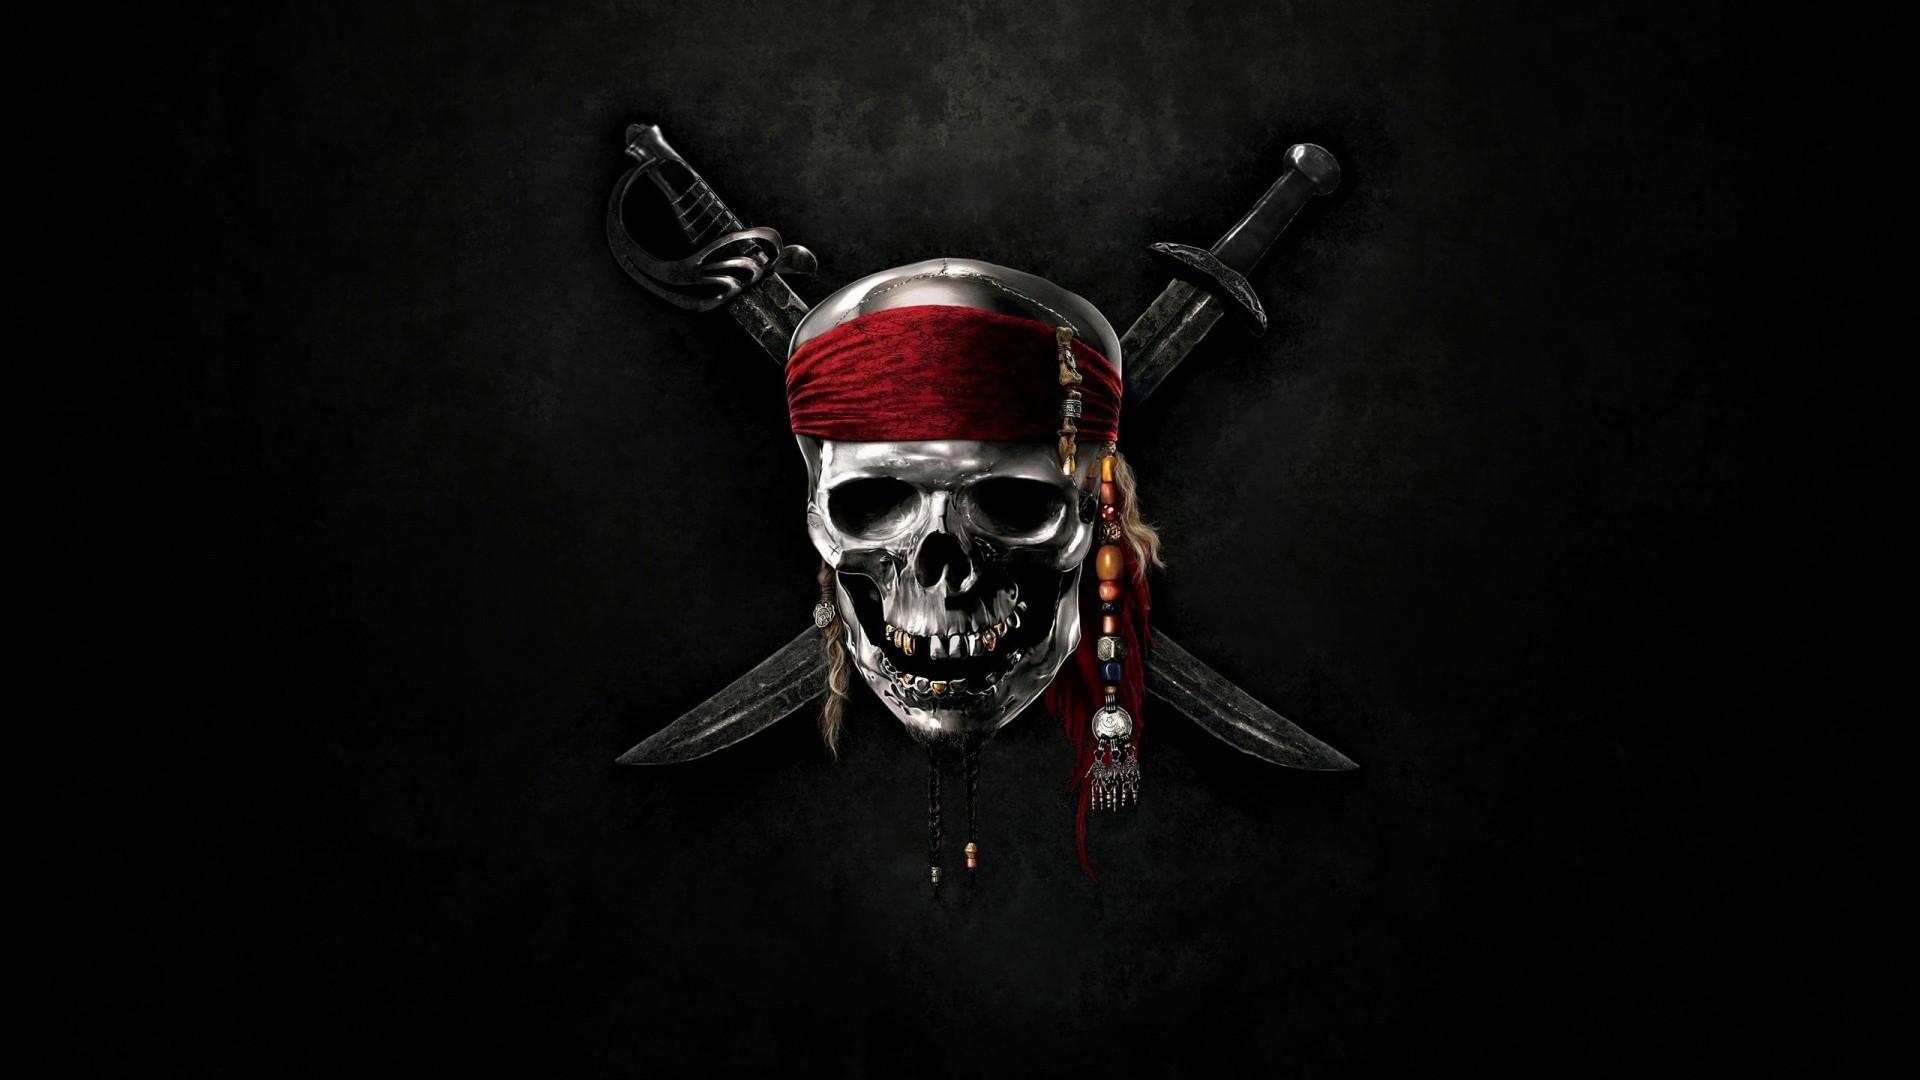 2048x1152 pirates of the caribbean skull 2048x1152 resolution hd 4k